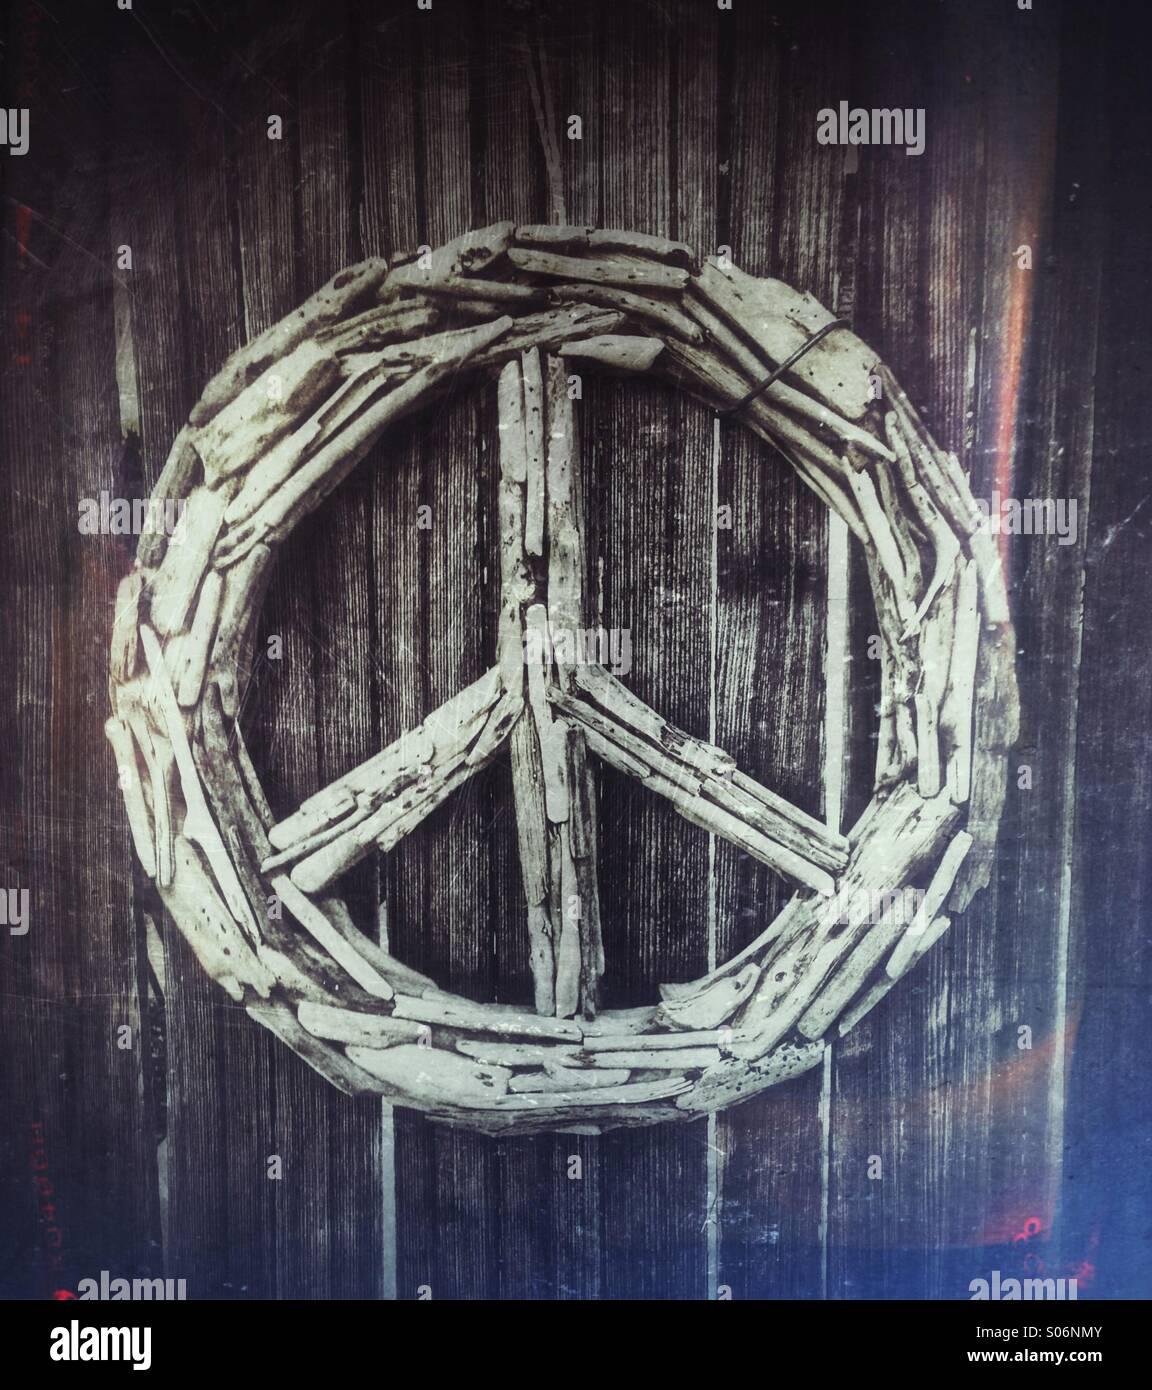 peace zeichen stockfoto bild 309935387 alamy. Black Bedroom Furniture Sets. Home Design Ideas